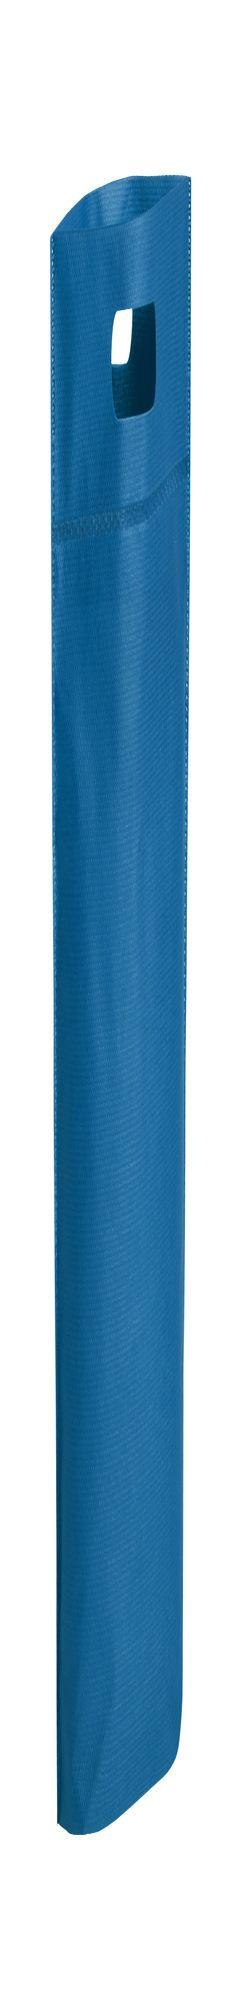 Сумка Baggy, малая, синяя фото